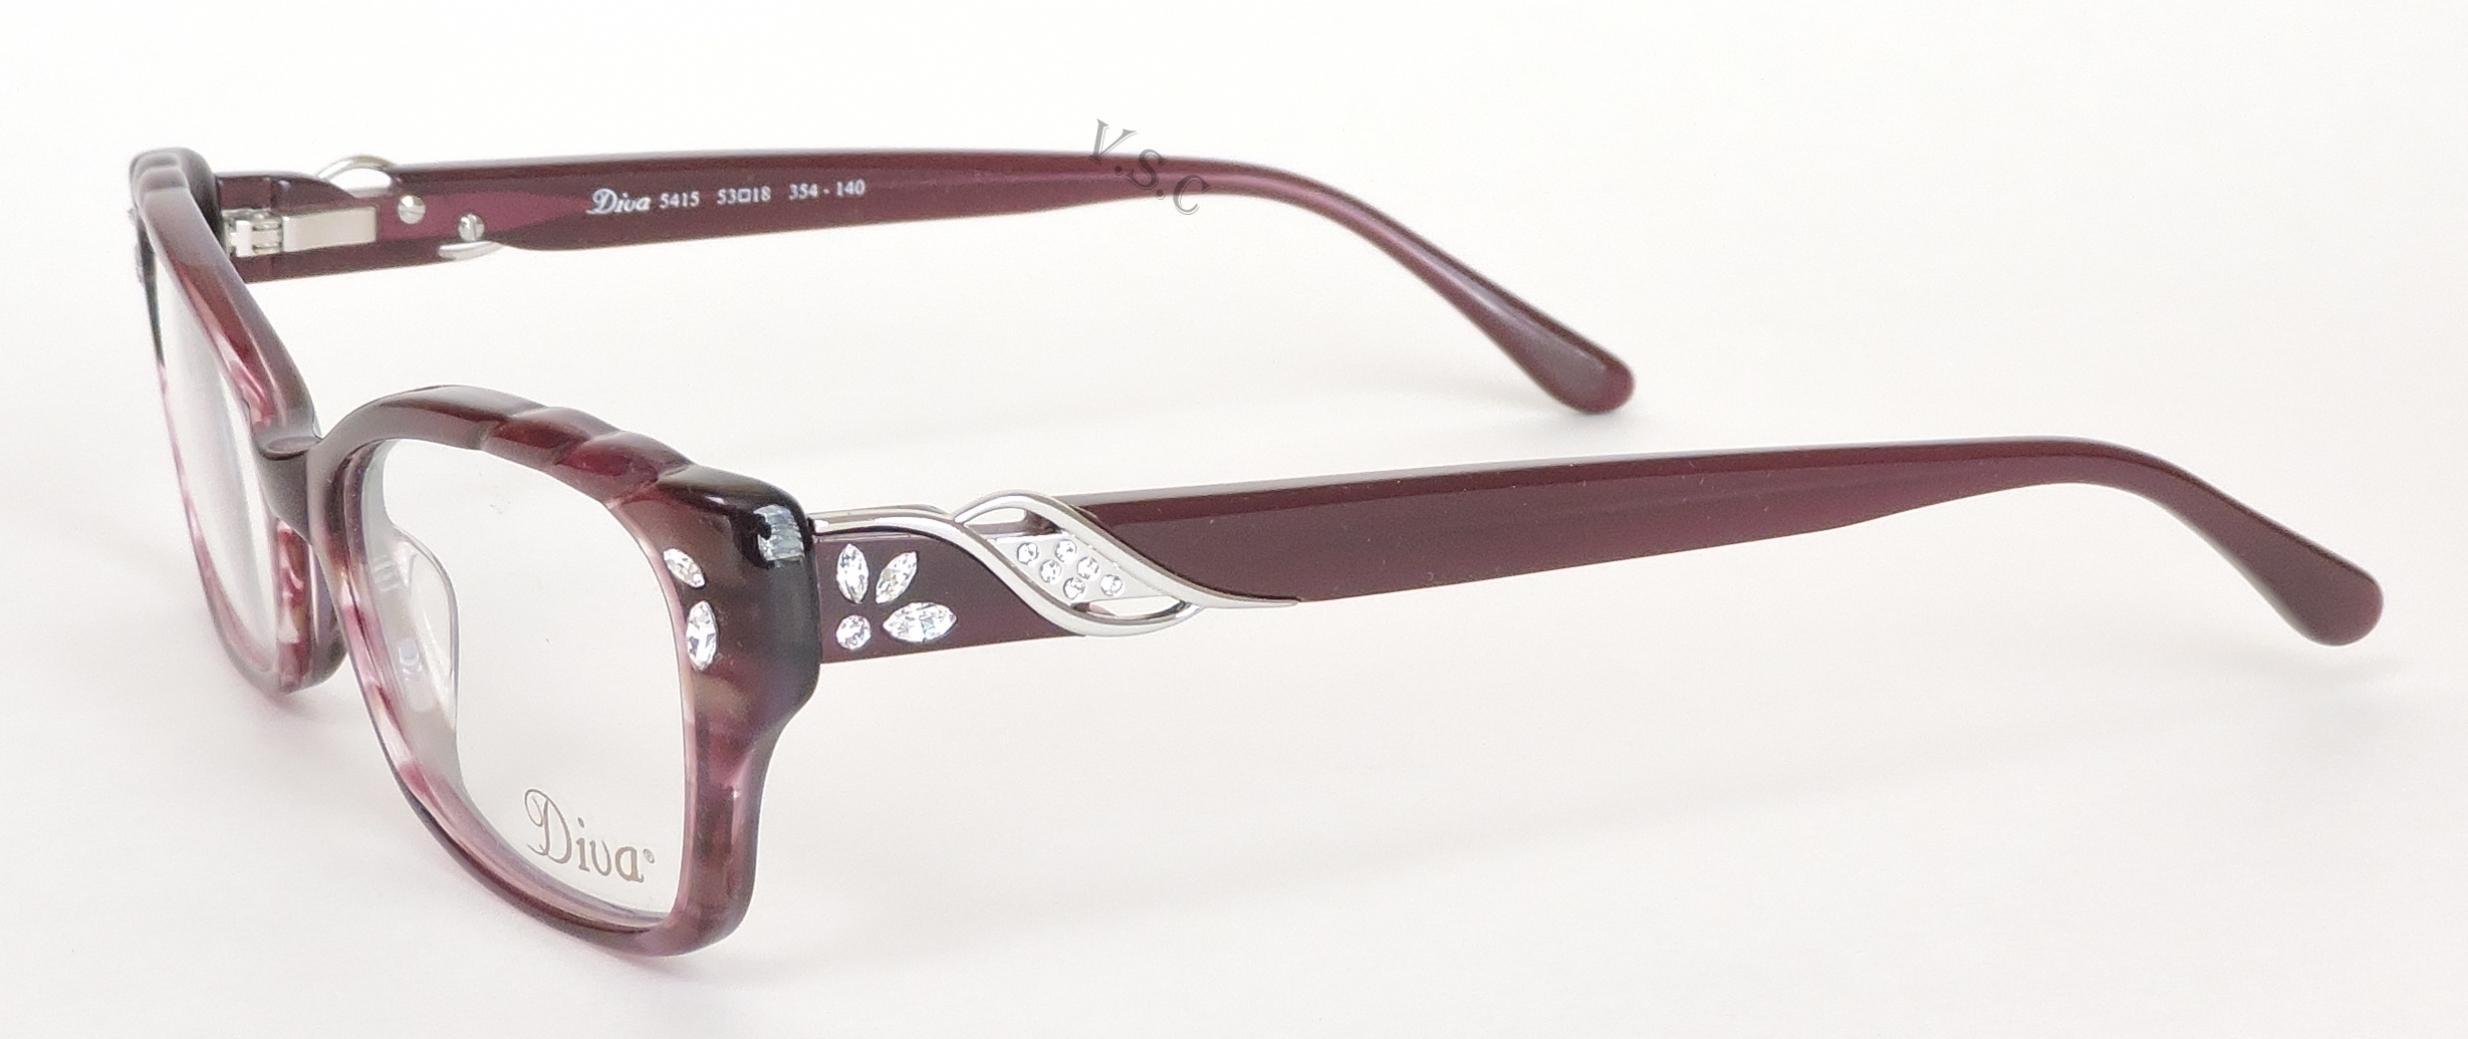 Attractive Diva Glasses Frames Collection - Framed Art Ideas ...